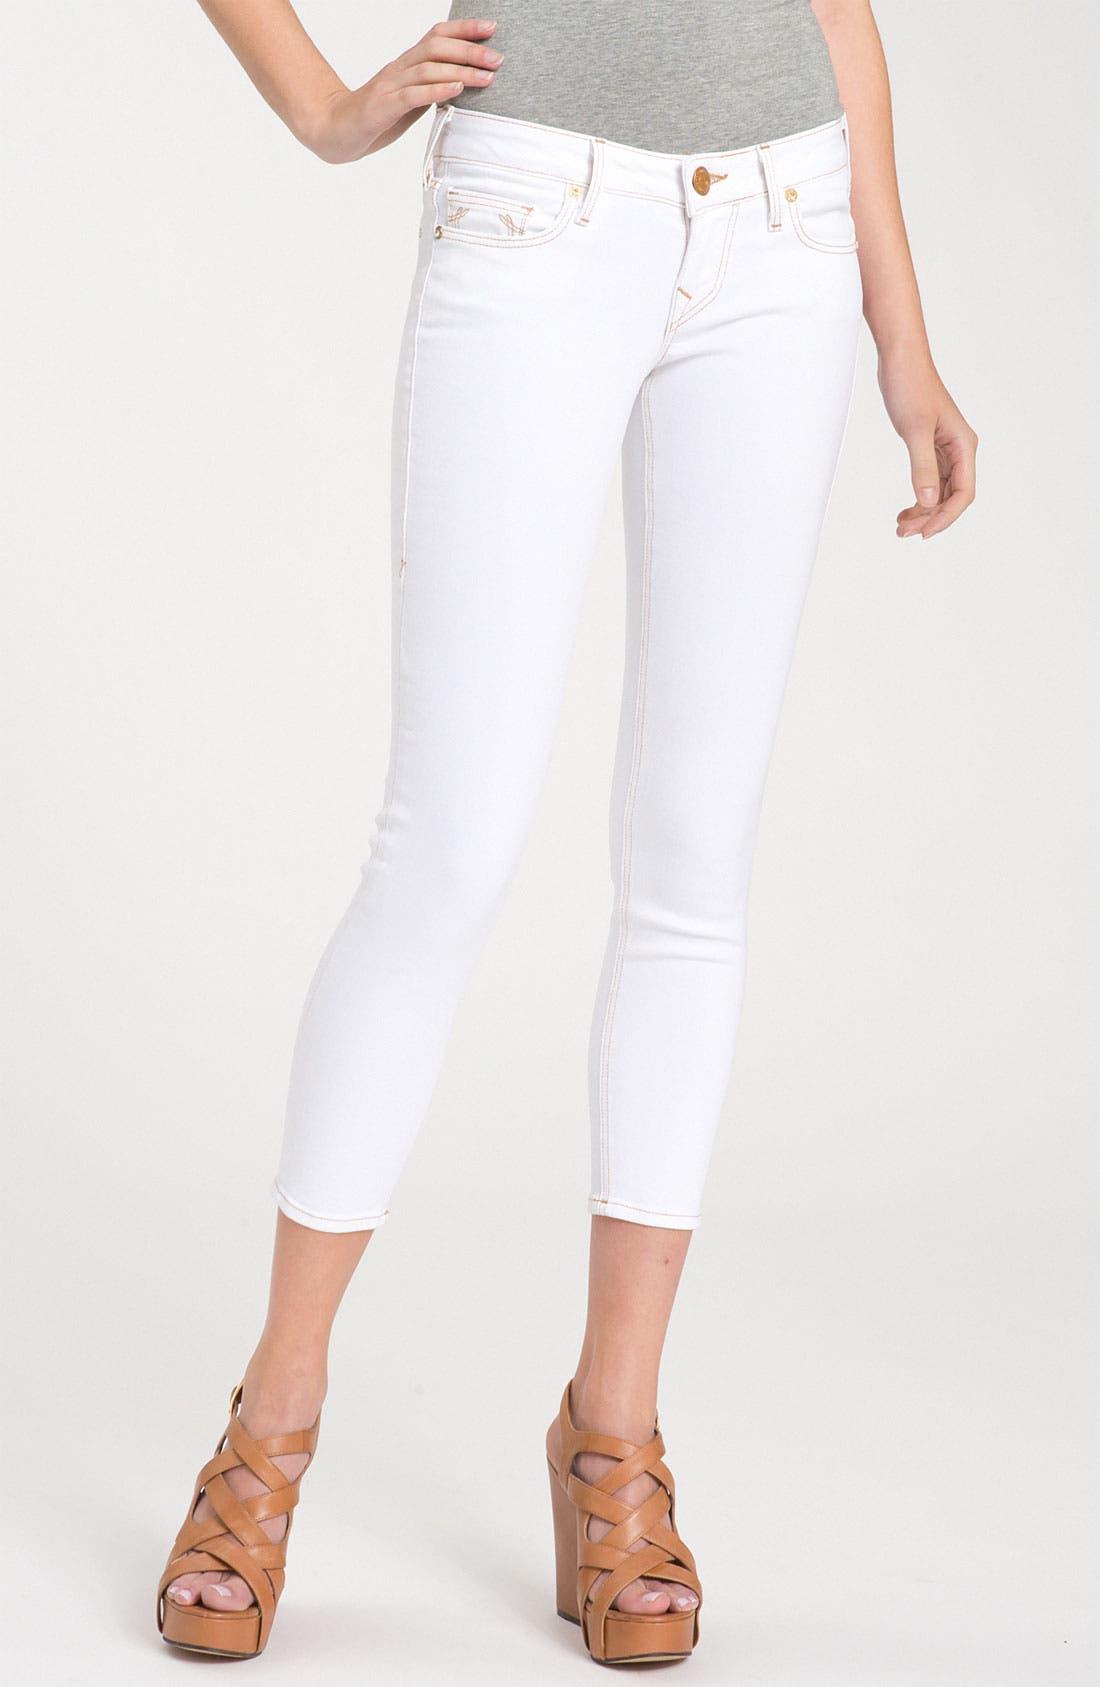 Alternate Image 2  - True Religion Brand Jeans 'Brooklyn' Skinny Crop Jeans (Optic White)